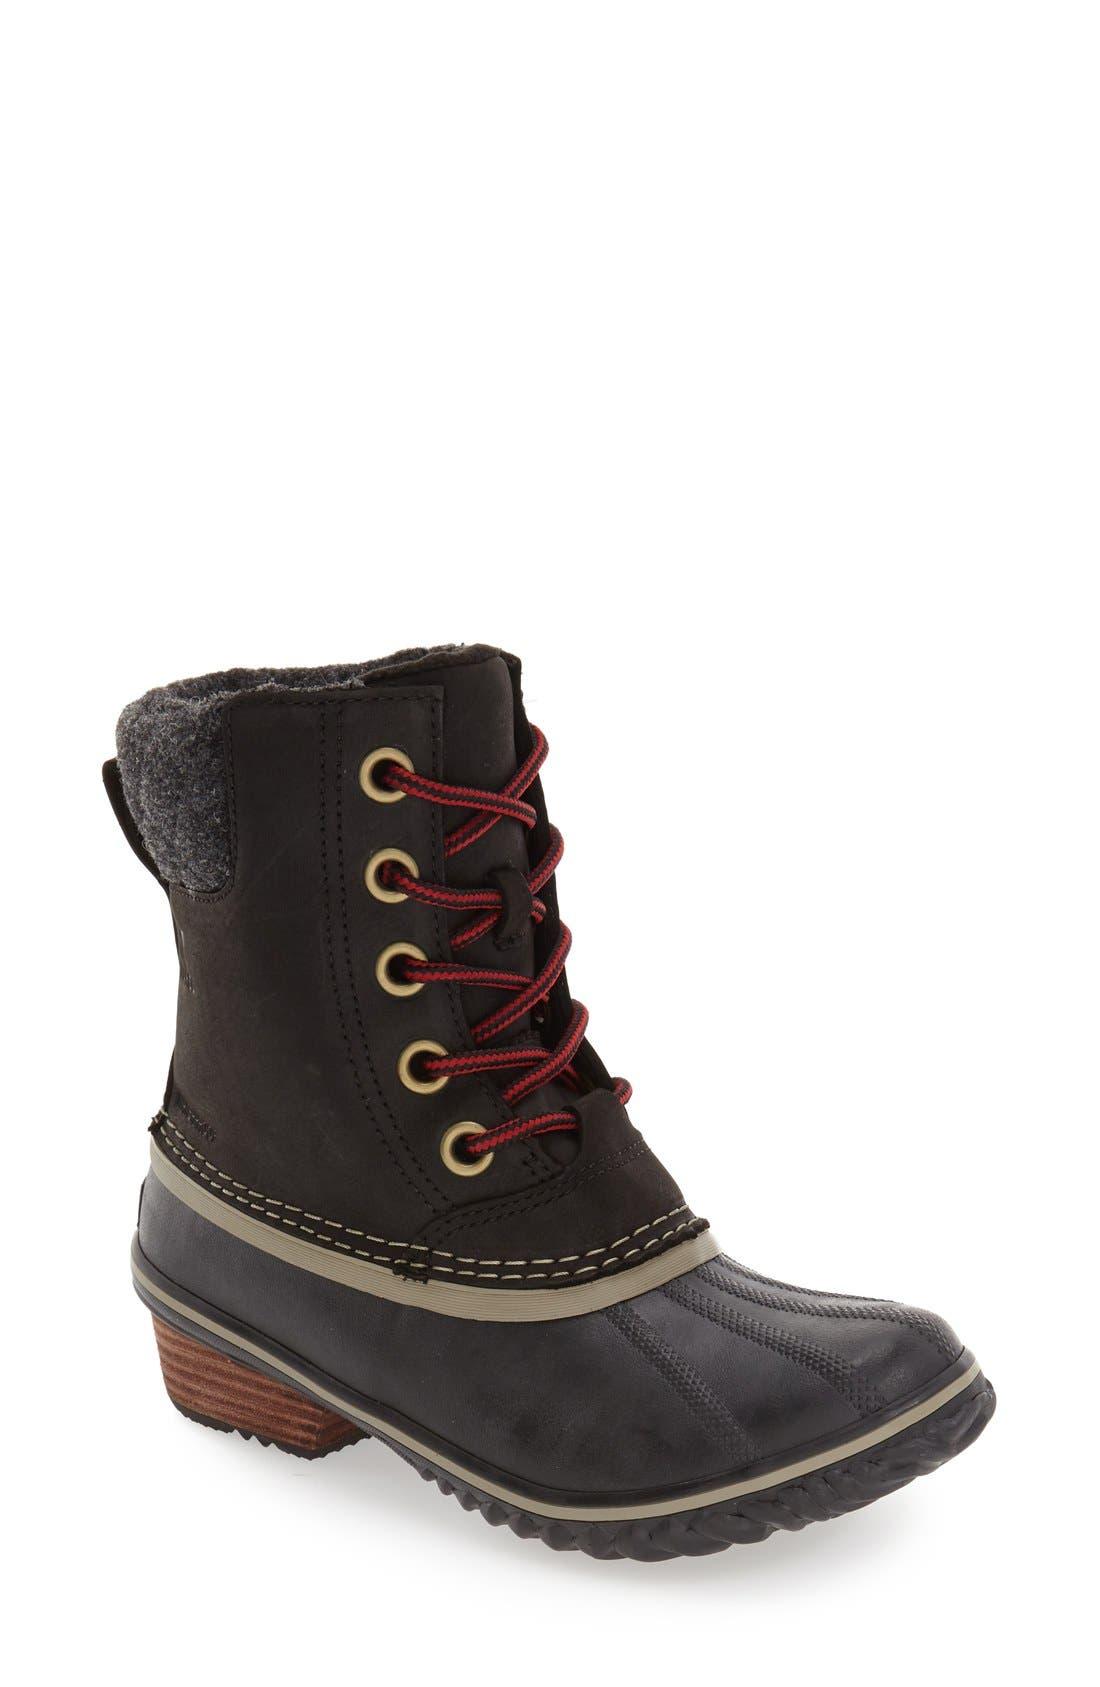 SOREL Slimpack II Waterproof Boot, Main, color, BLACK